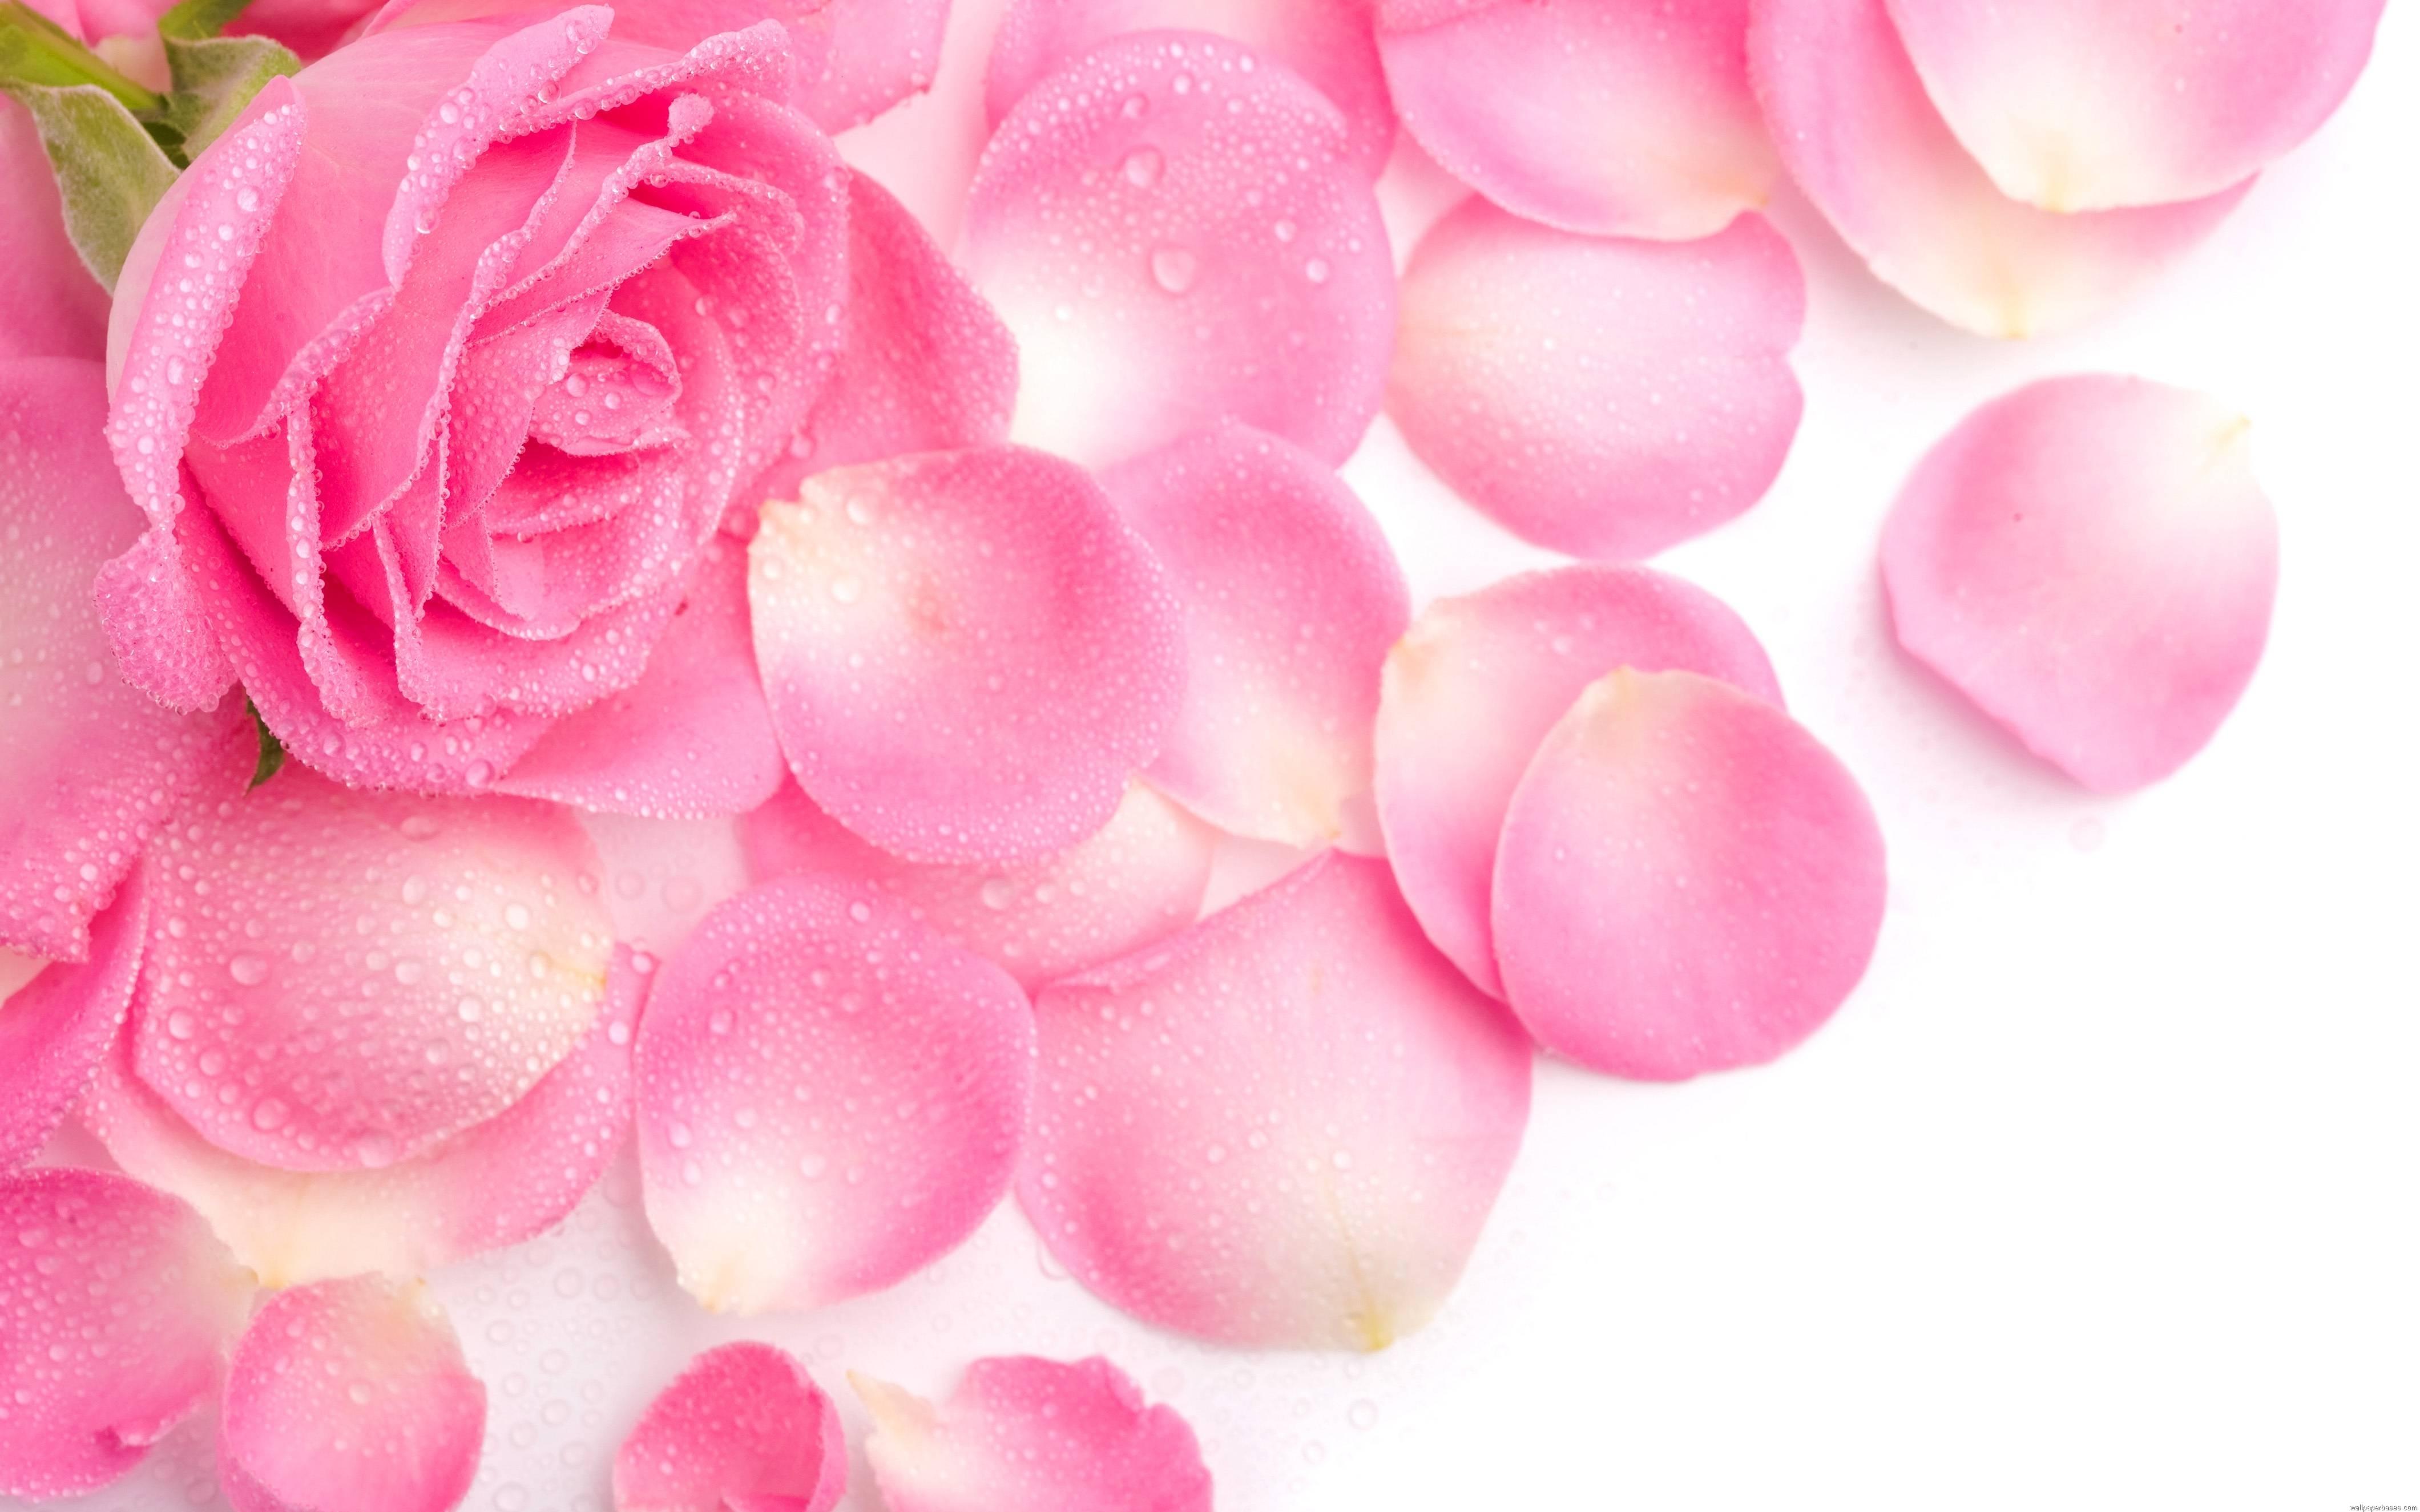 pink rose background wallpaper 07151 - baltana